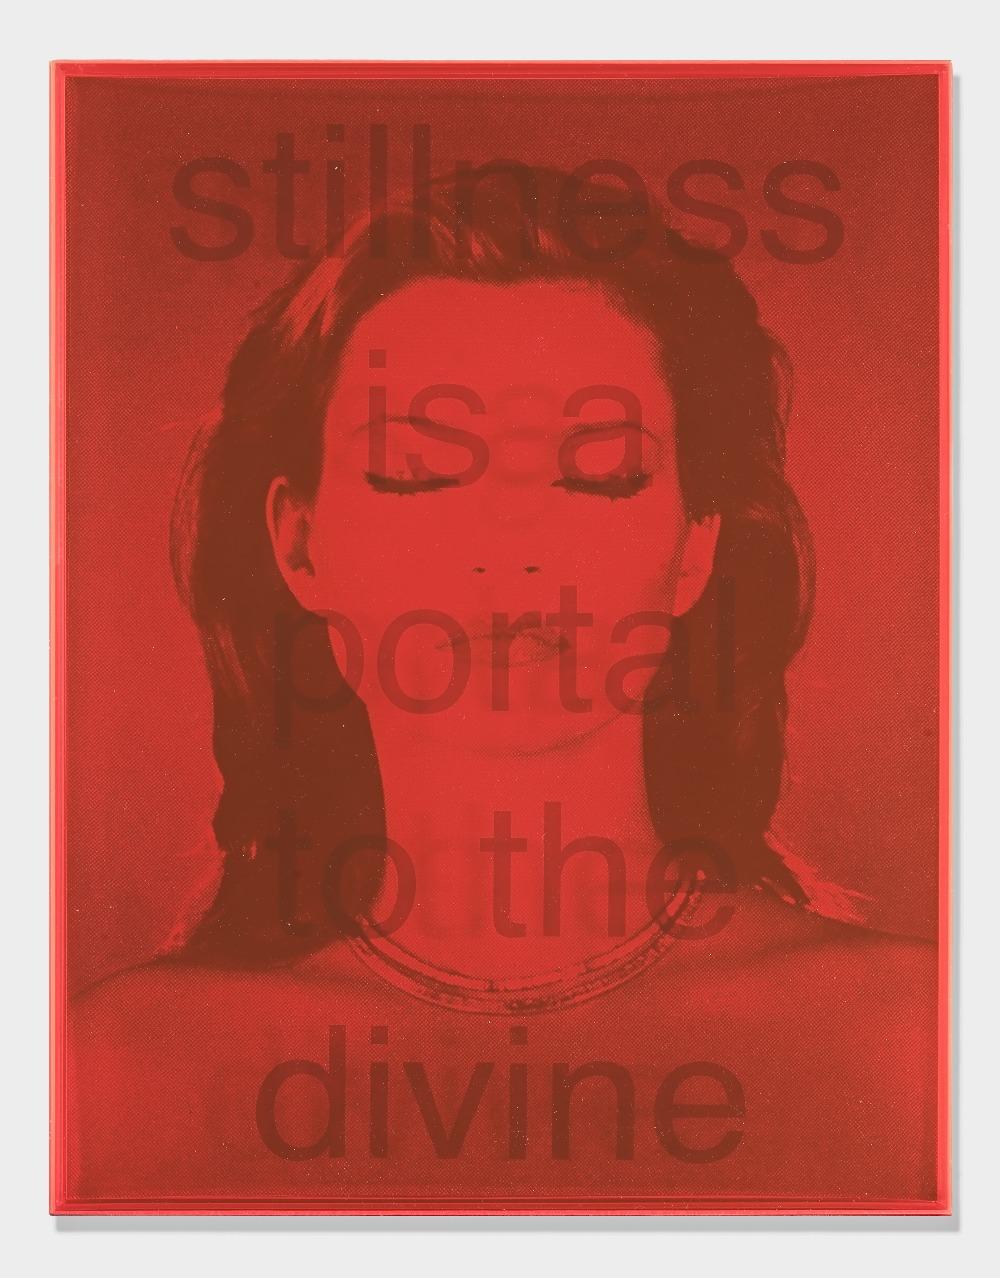 Chris Levine (British 1960-), 'Stillness Is A Portal To The Devine', 2021 - Image 3 of 3